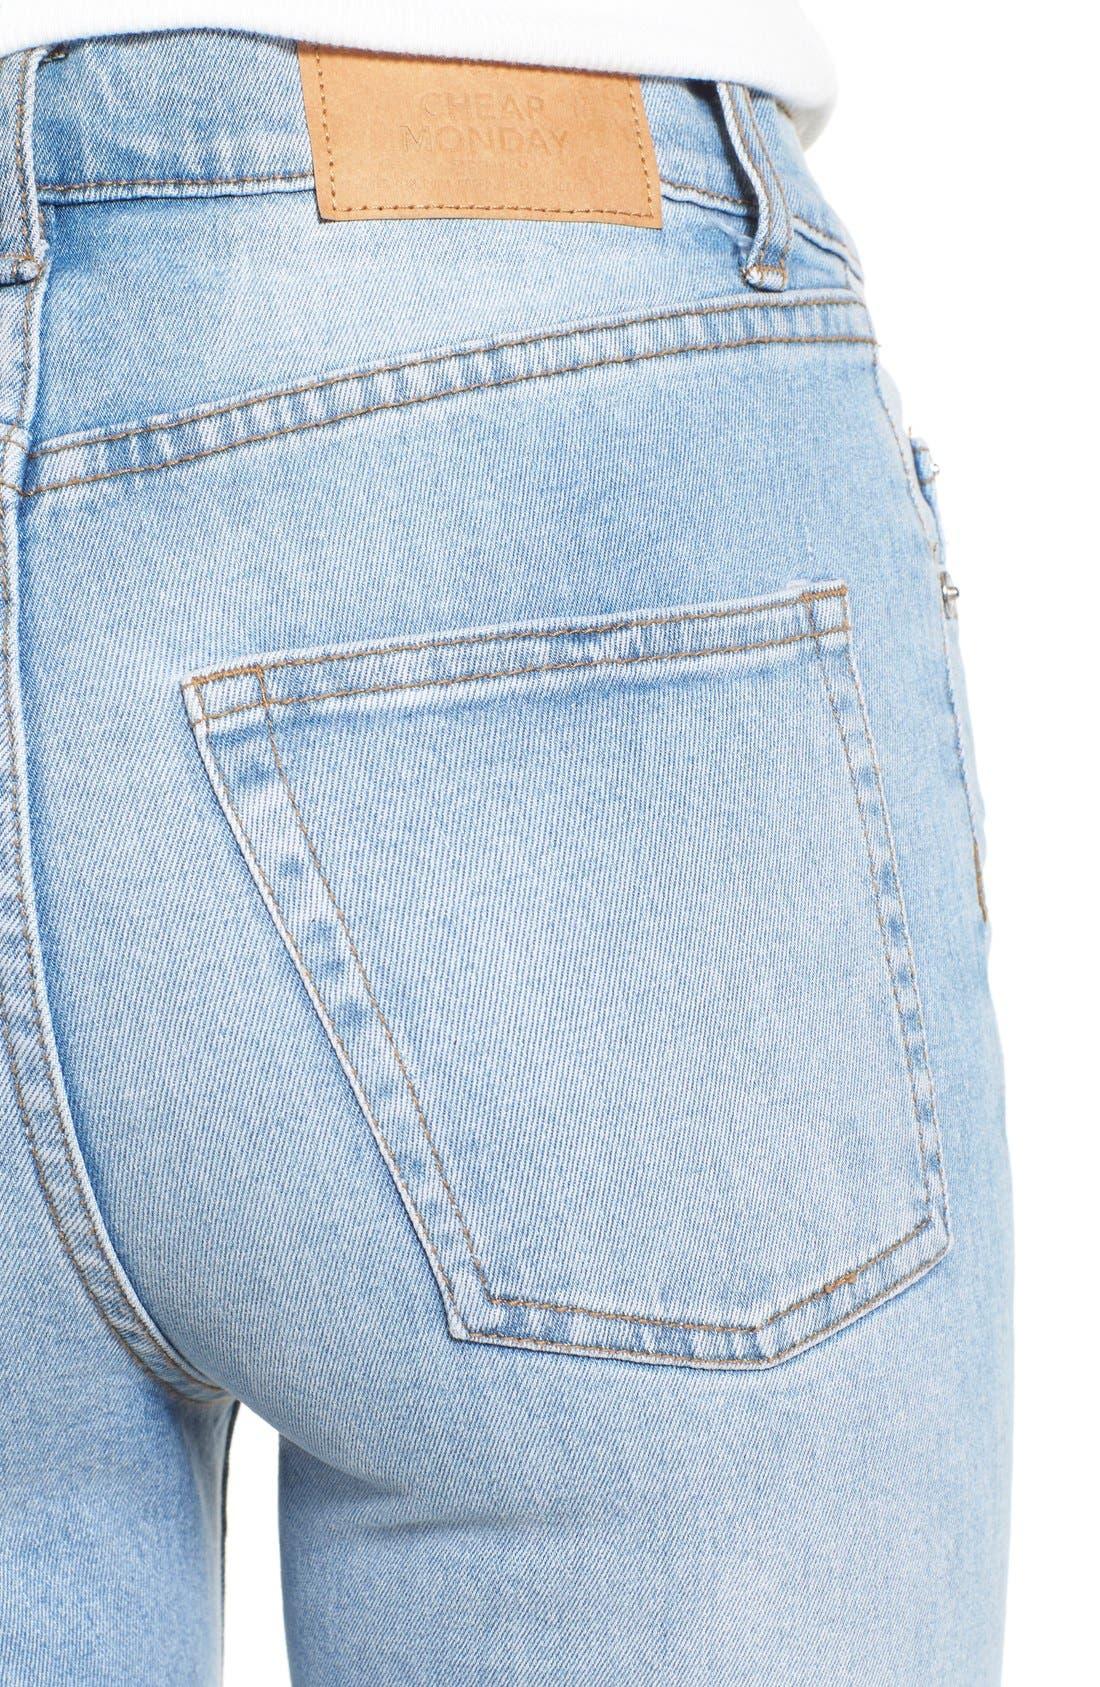 Alternate Image 4  - Cheap Monday 'Second Skin' Skinny Jeans (Stonewash Blue)